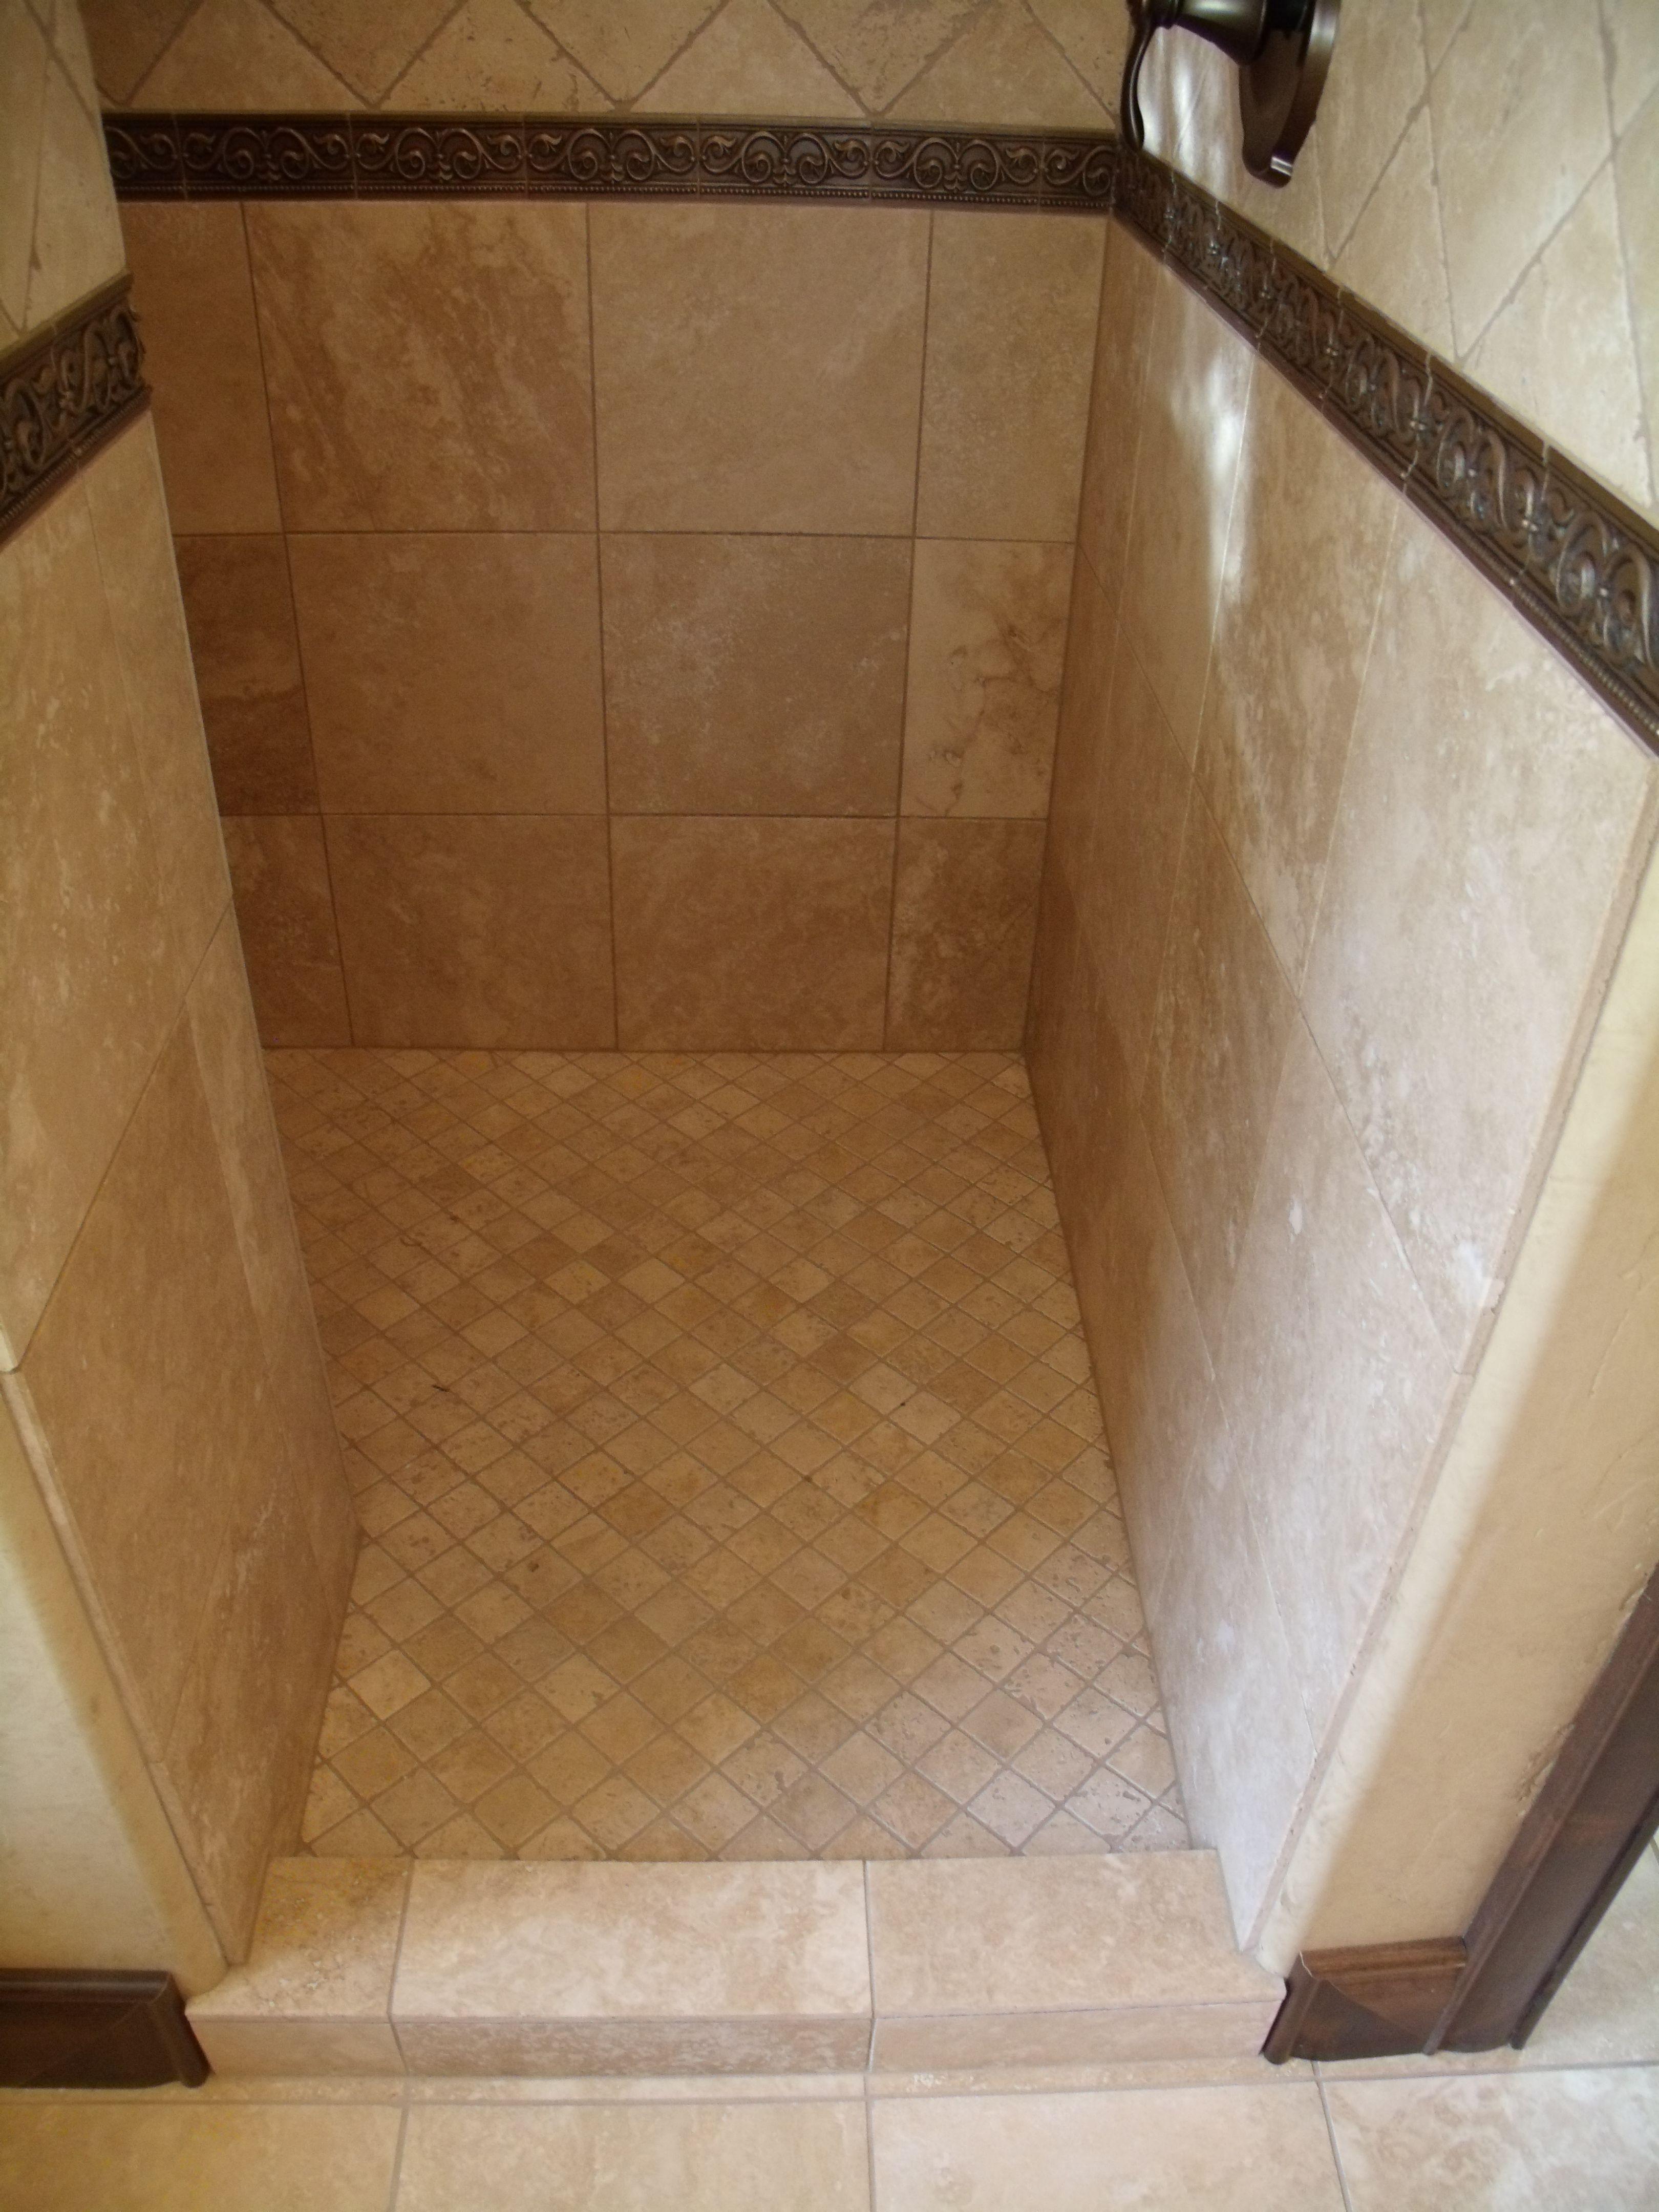 Master Shower Done In Marble Done By John Martin Tile Johnmartintile Yahoo Com Master Shower Shower Set Tile Design